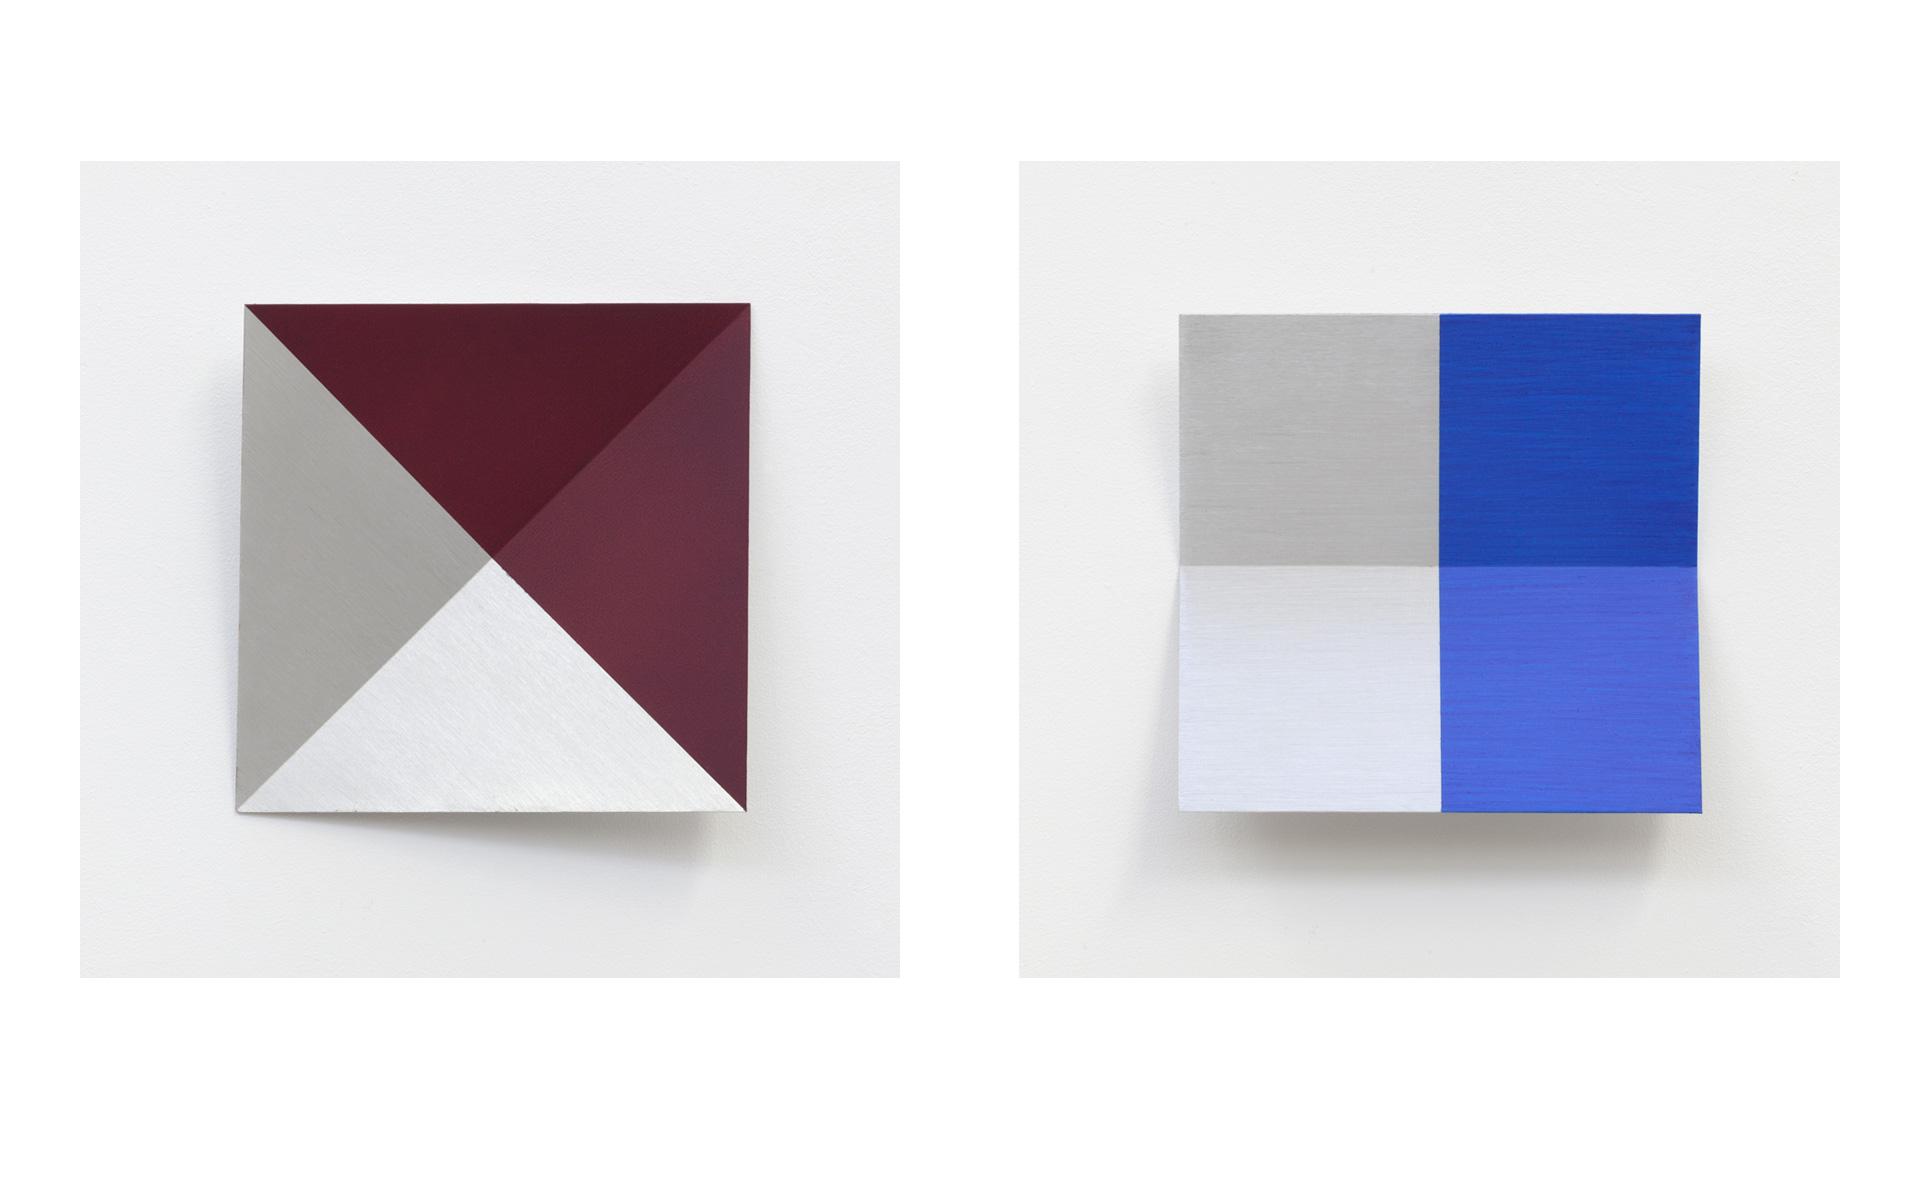 left: O. T. (bordeaux), 1995 Acrylic on aluminum 30 × 30 × 5 cm / right: O. T. (blau), 1995 Acrylic on aluminum 30 × 30 × 5 cm - Photos: Christoph Valentien